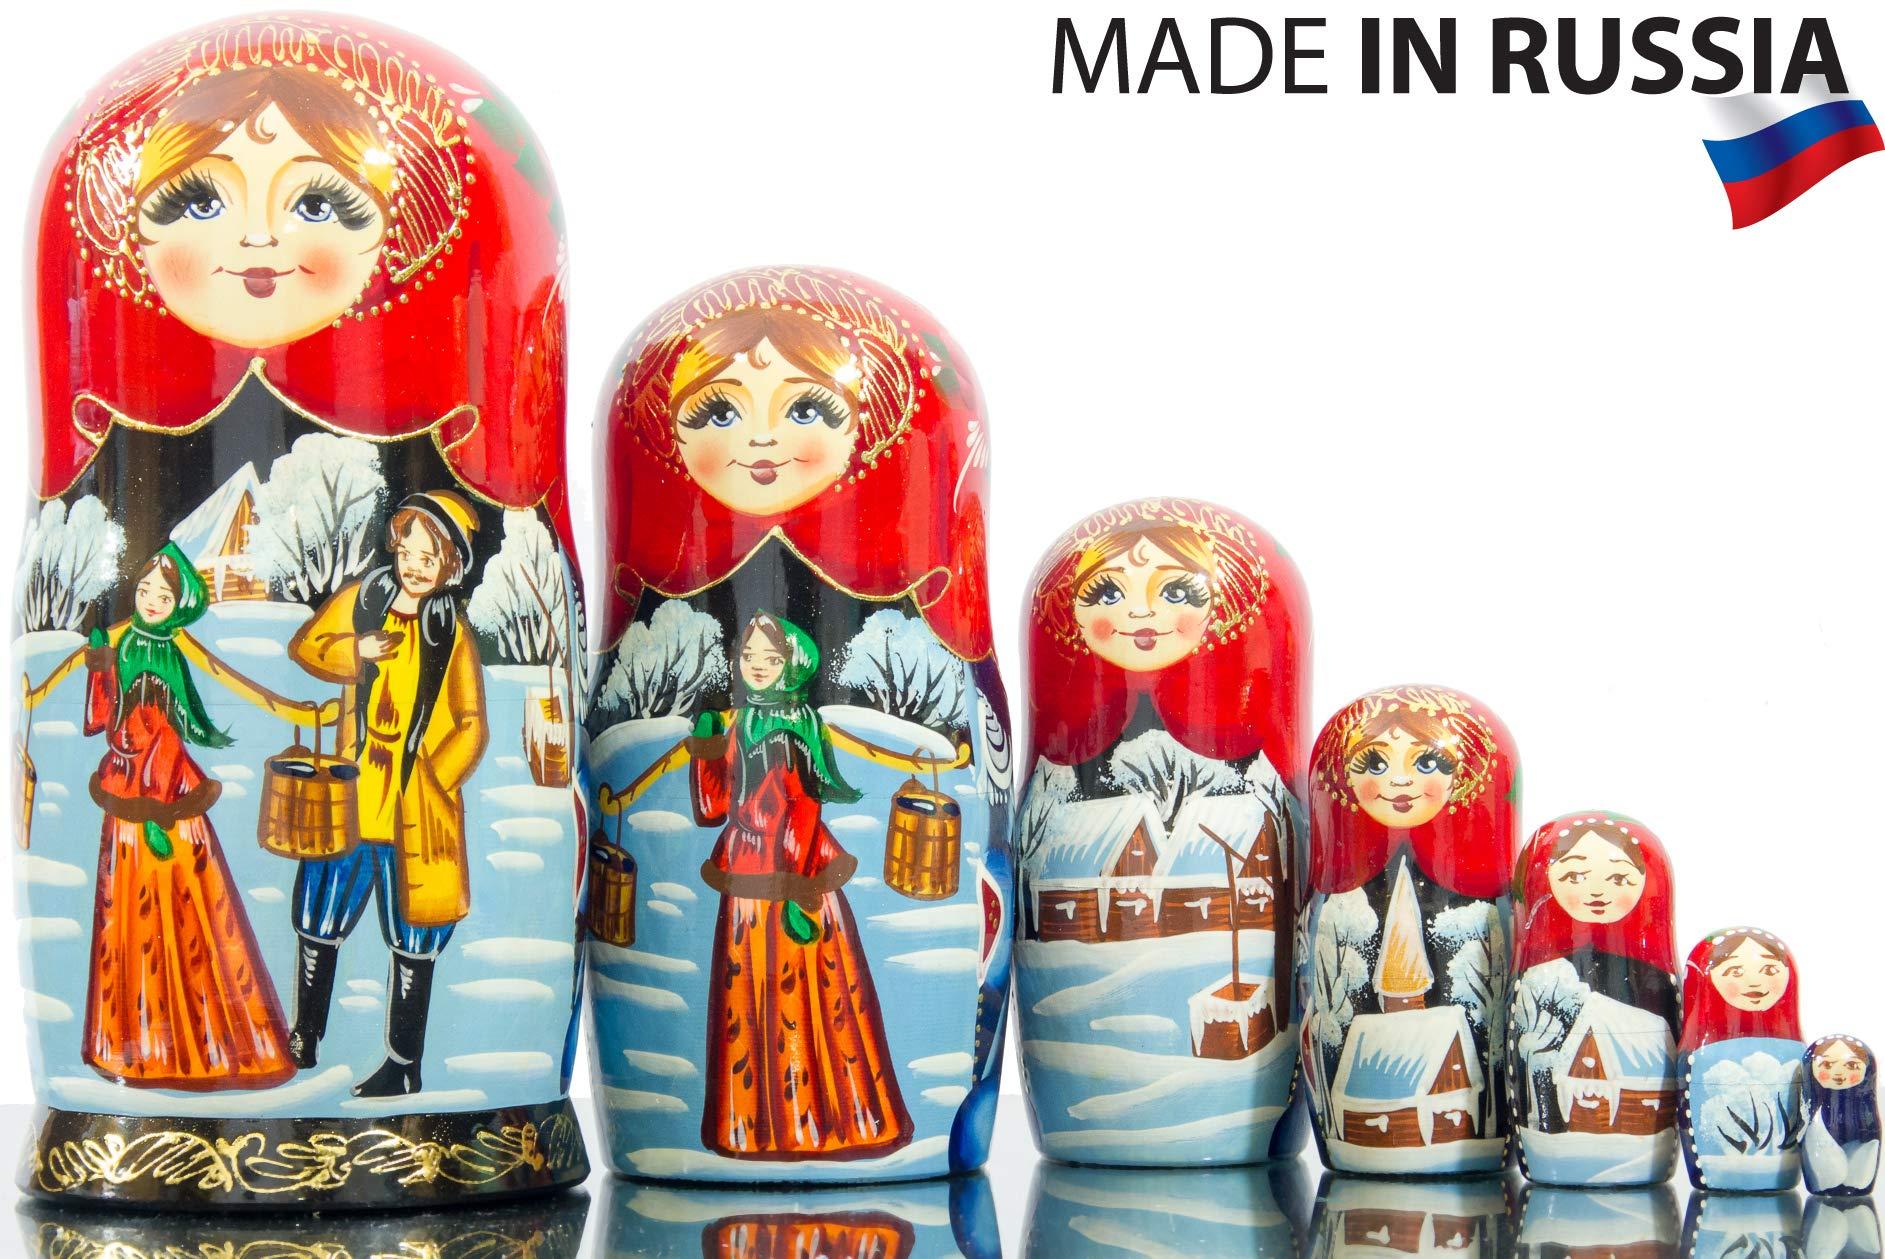 Russian Nesting Doll - Siberian Winter - Hand Painted in Russia -- Big Size - Traditional Matryoshka Babushka (8.25`` 7 Dolls in 1)